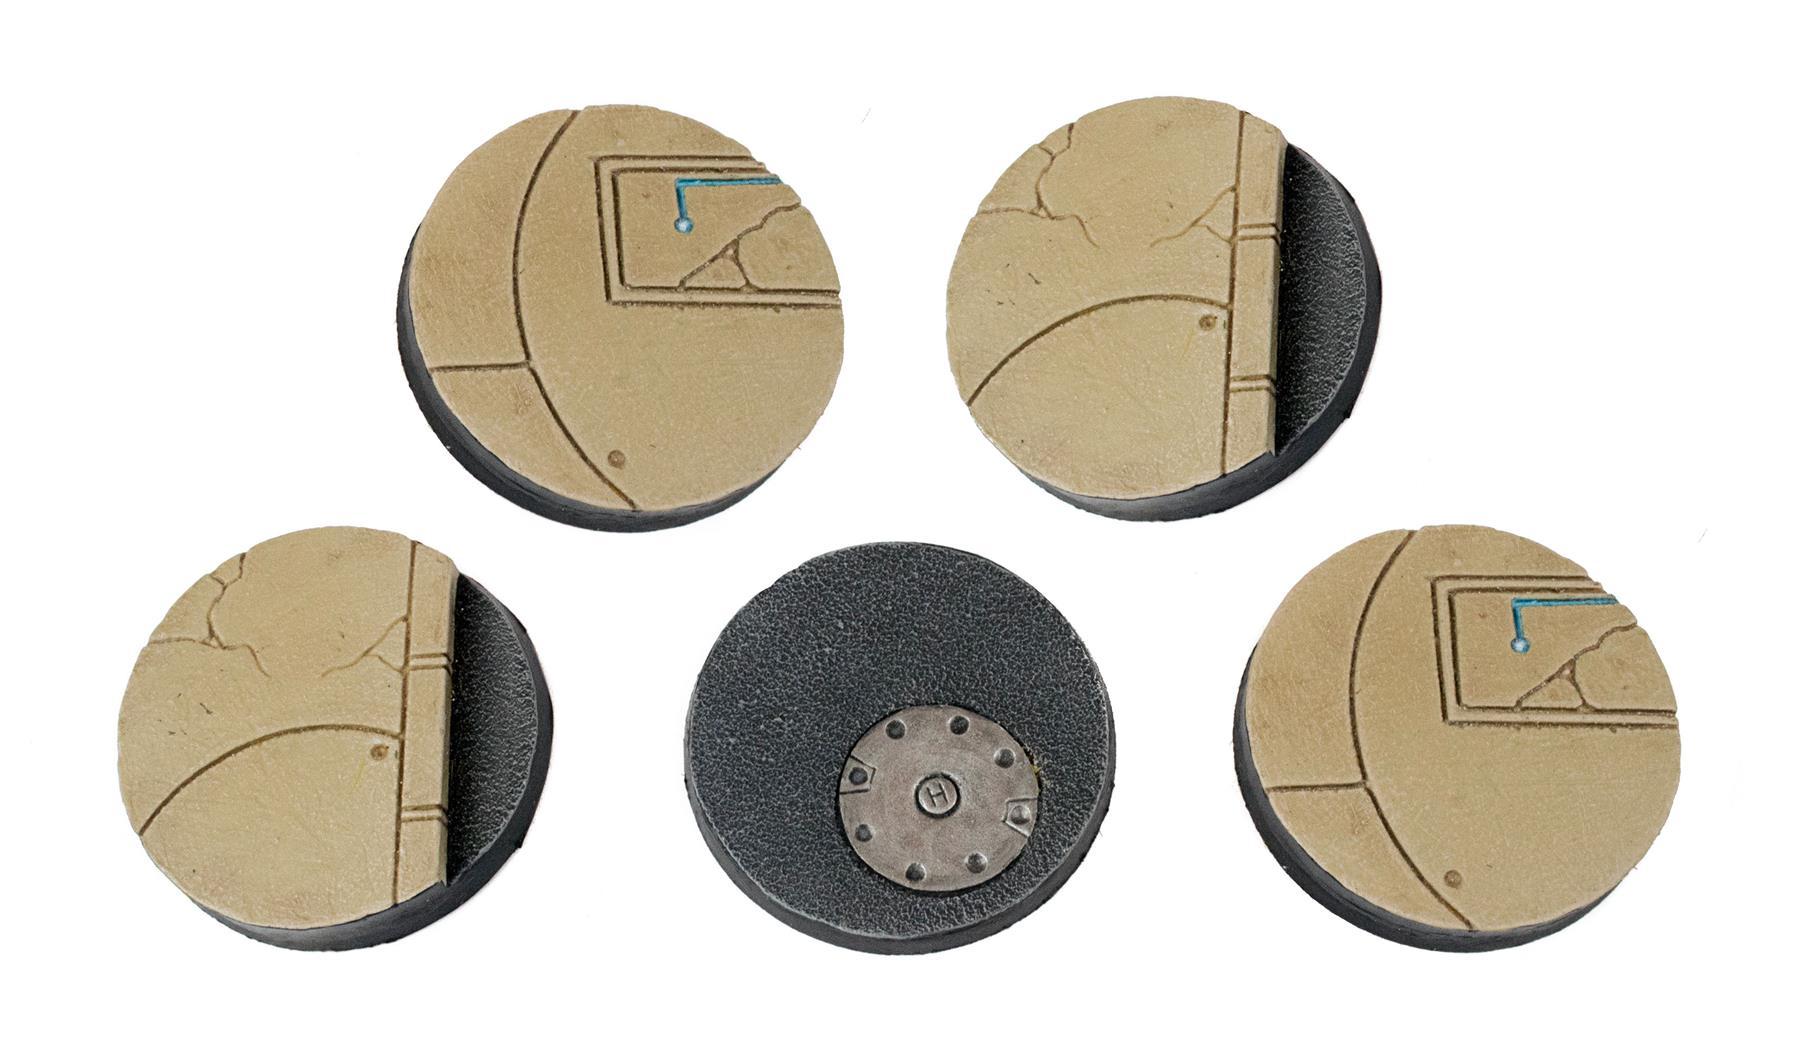 WWG Industry of War Sci-Fi Street Bases x 10 \u2013 28mm Wargaming Miniatures 25mm